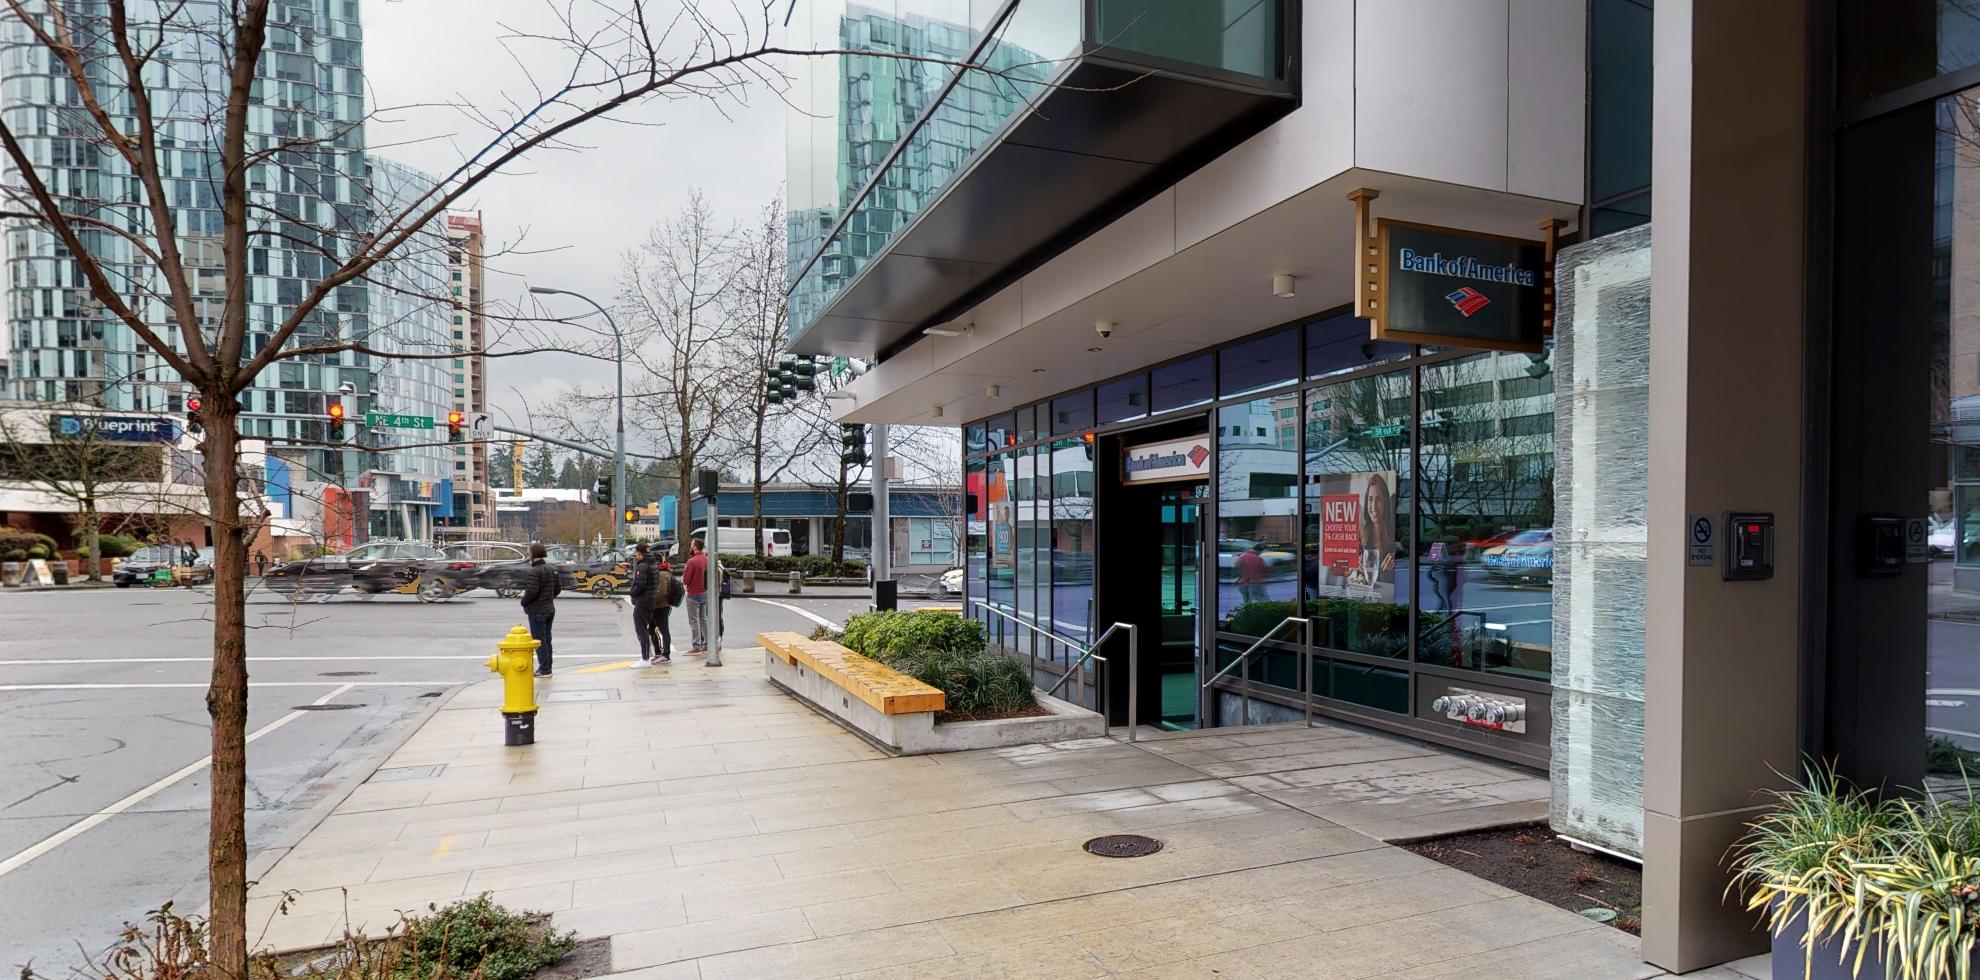 Bank of America financial center with drive-thru ATM   10572 NE 4th St, Bellevue, WA 98004